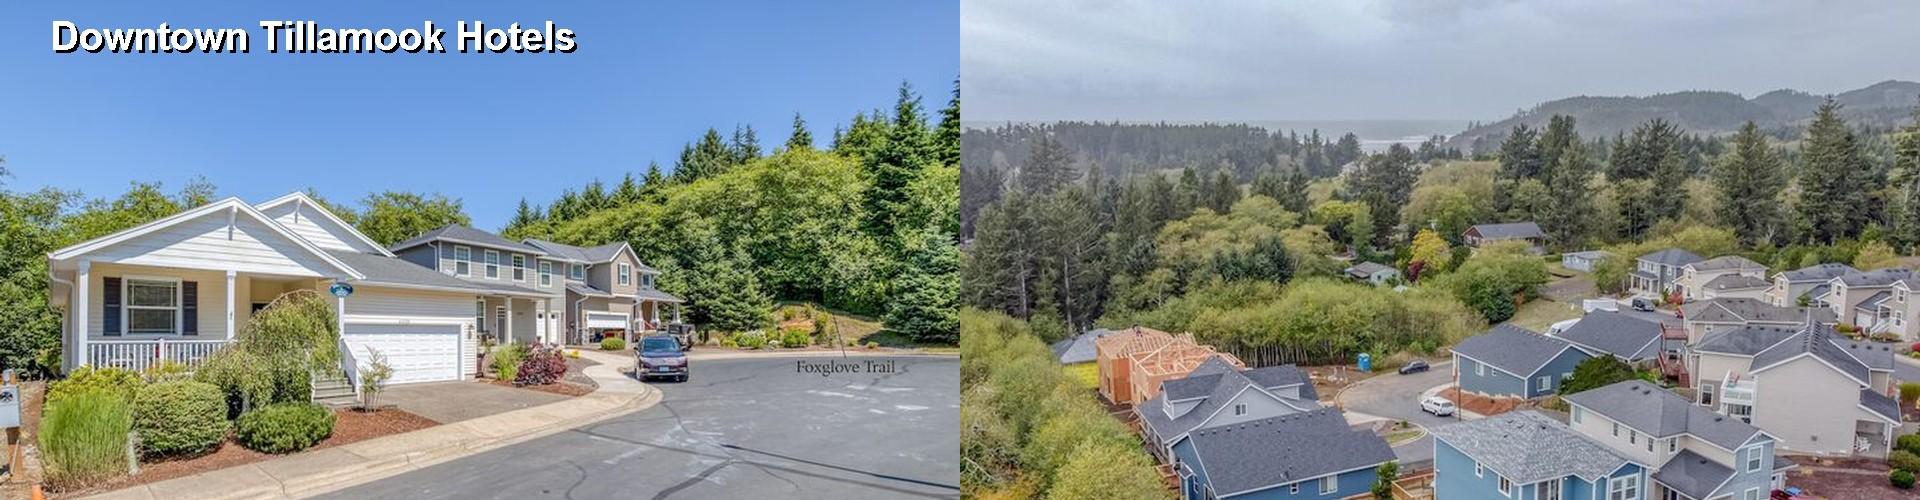 $56+ Hotels Near Downtown Tillamook in North Oregon Coast OR